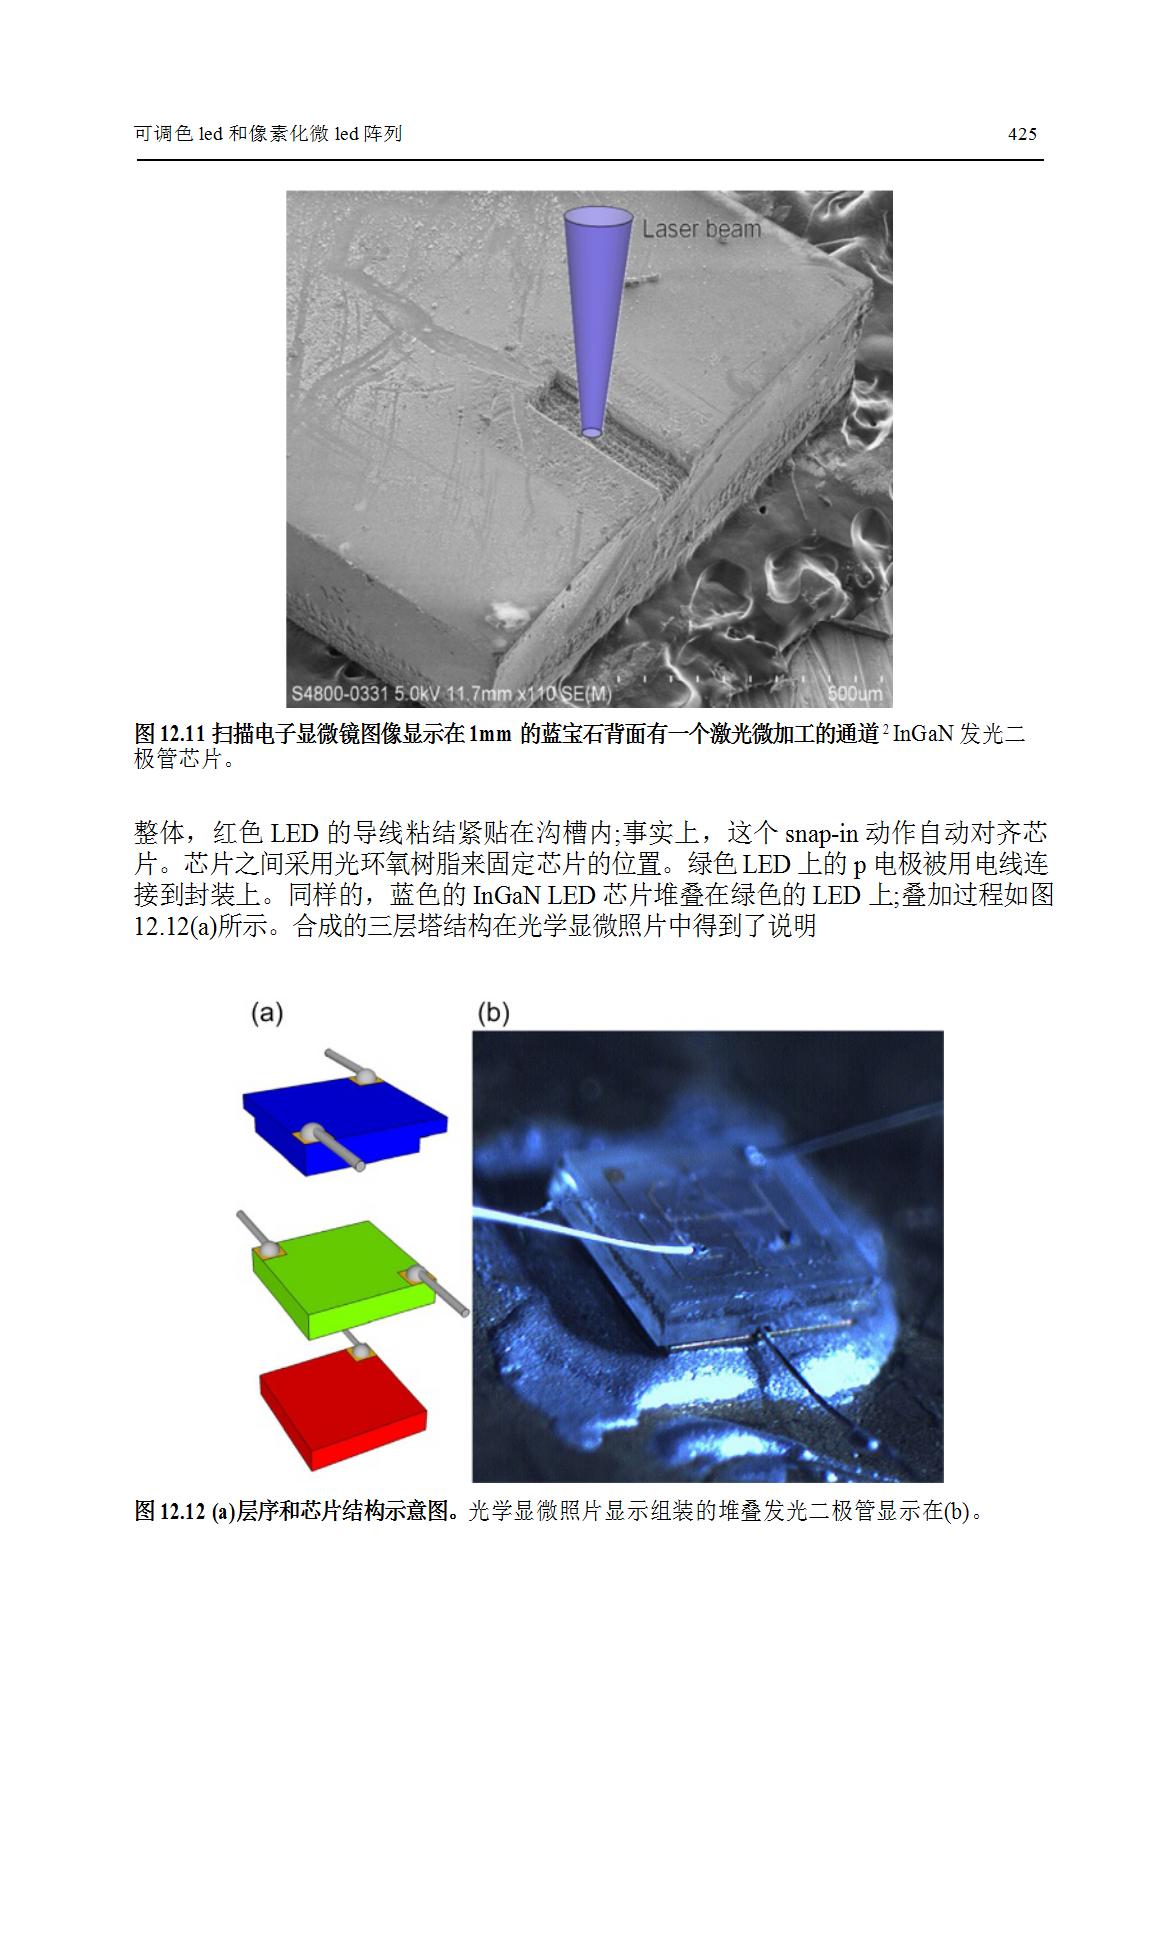 LED调色和像素化MicroLED阵列研究  第11张